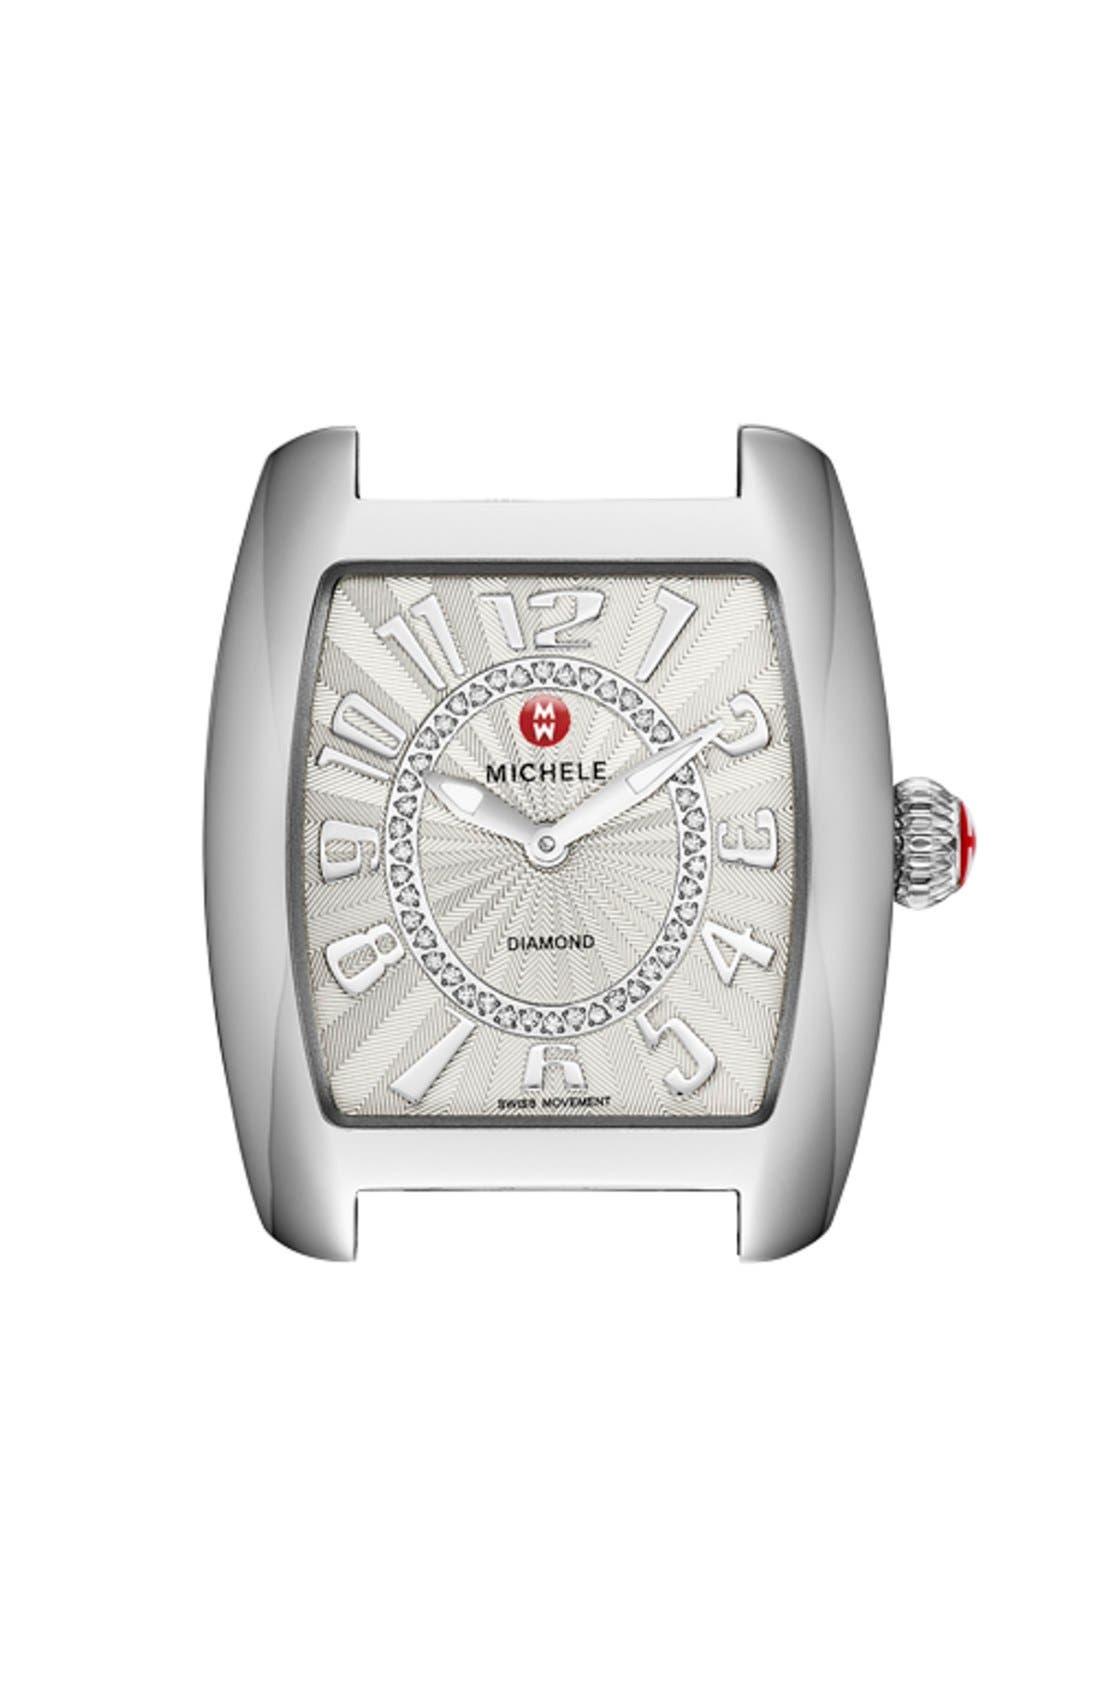 Main Image - MICHELE Urban Mini Diamond Dial Watch Case, 29mm x 30mm